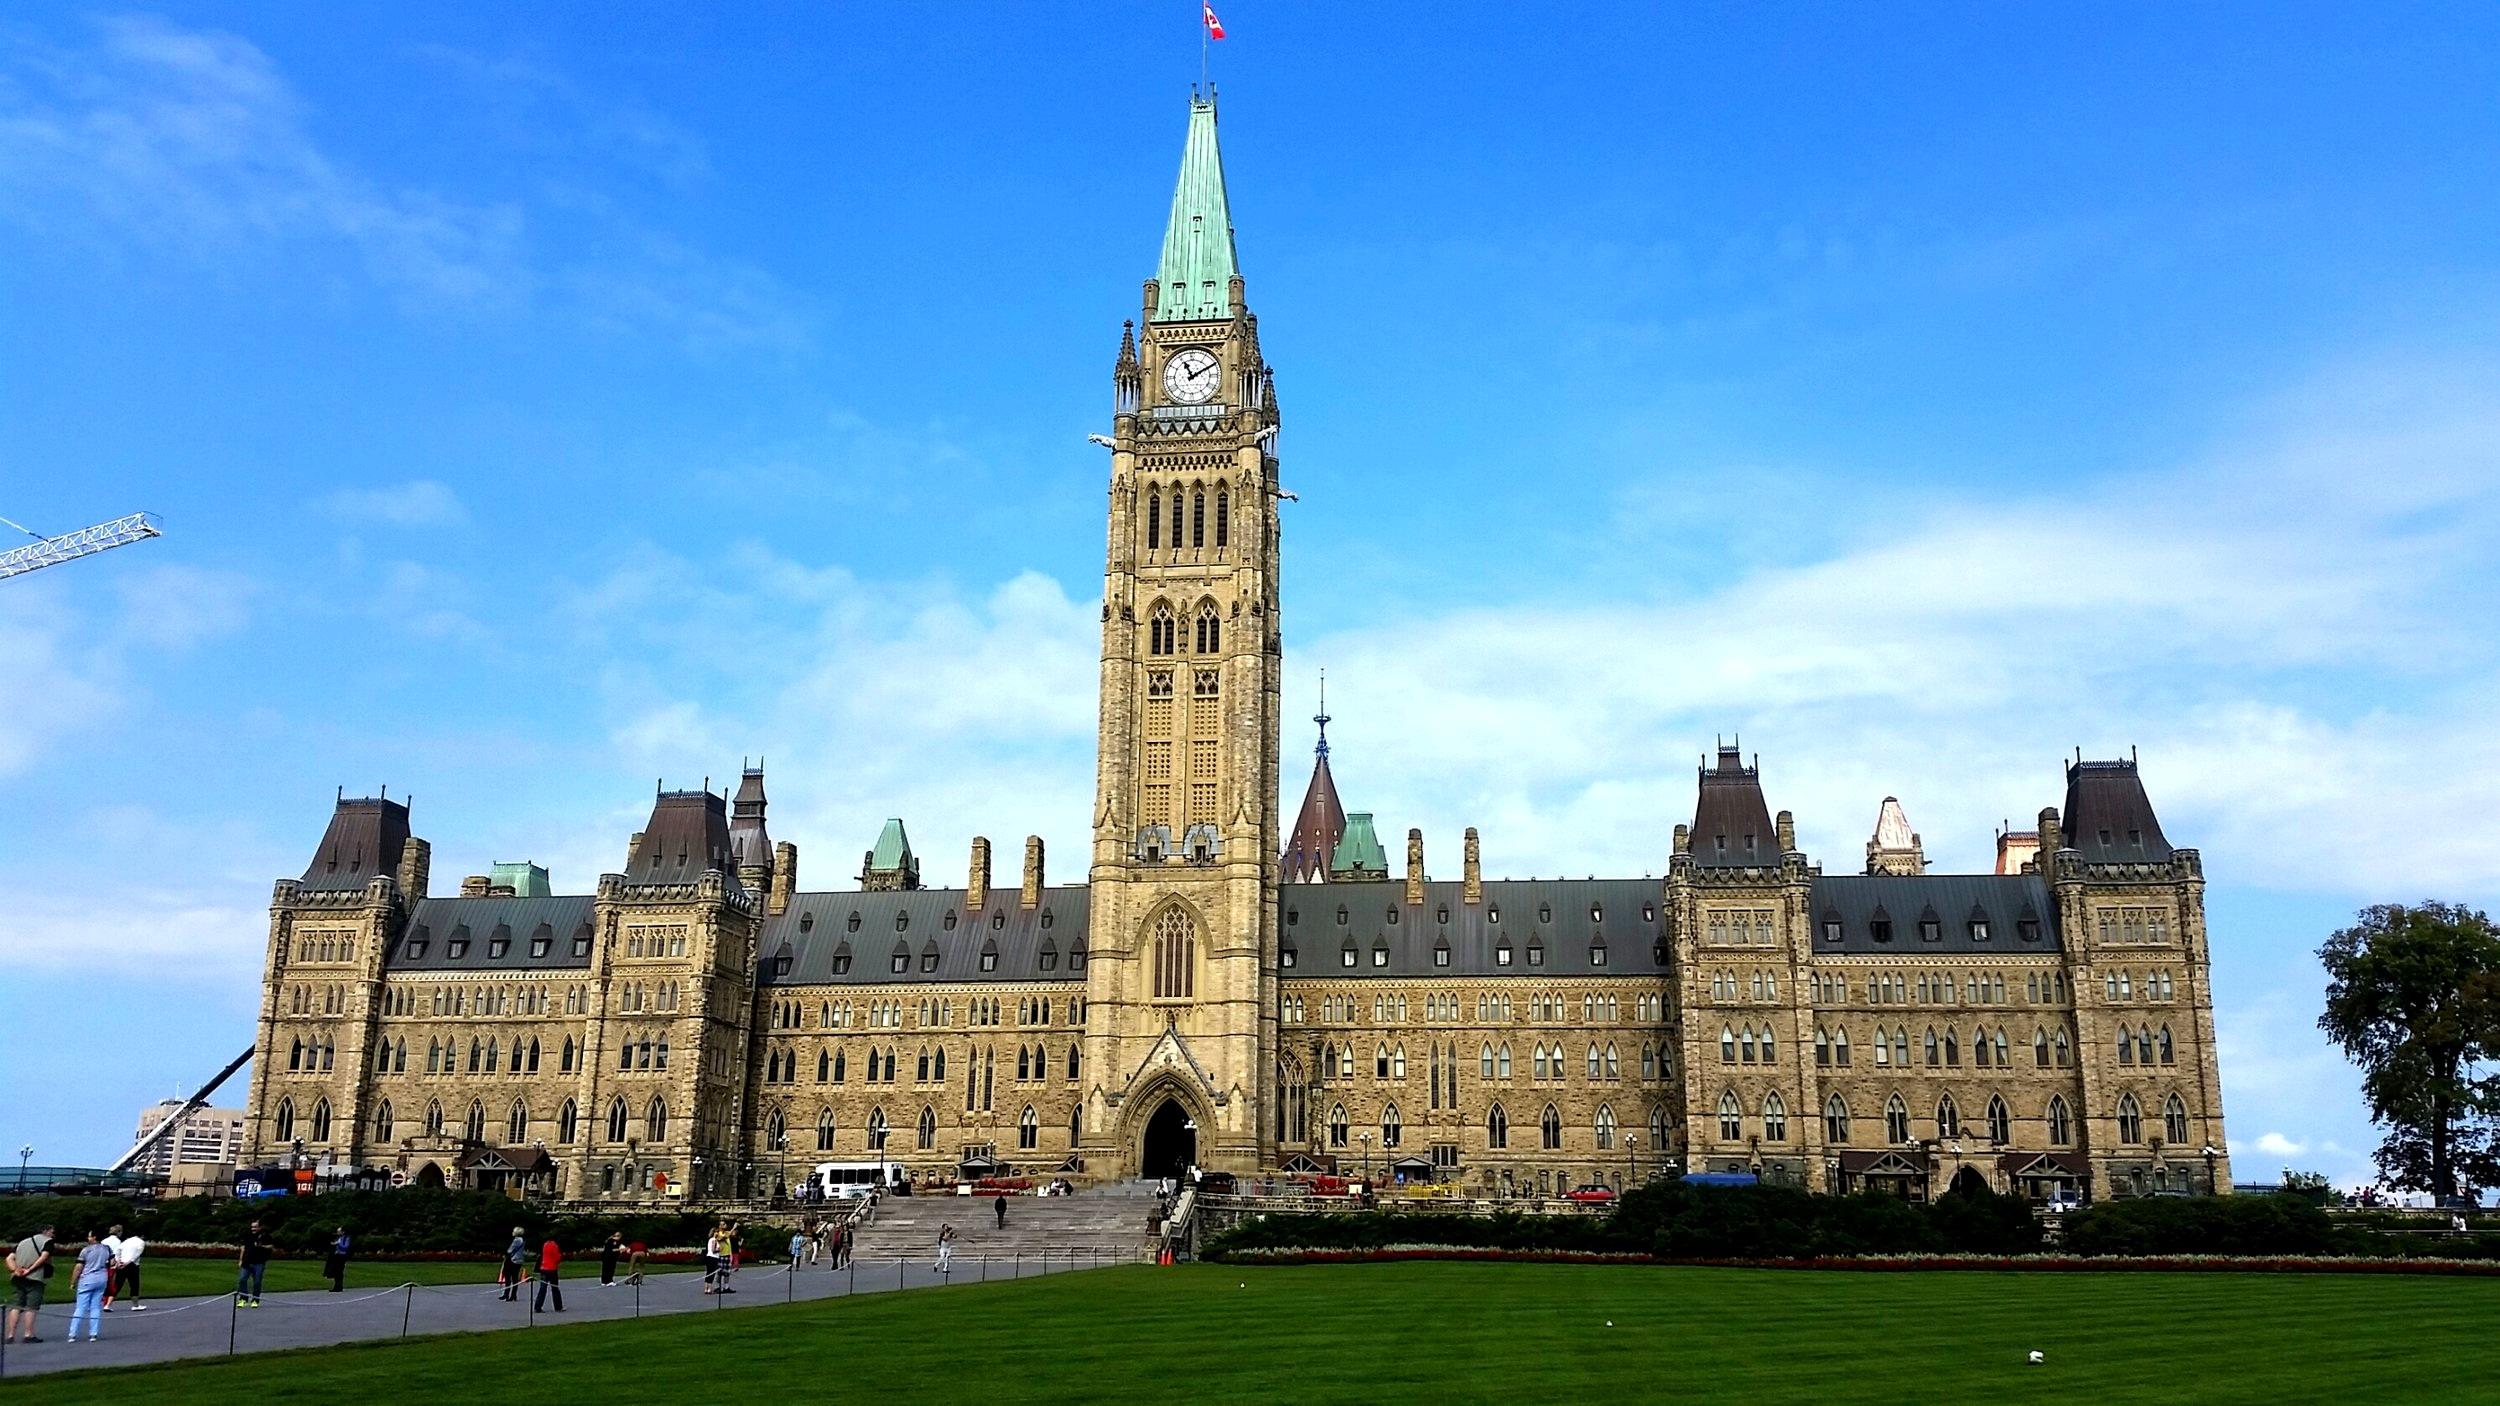 Ottowa, nice parliament building. Ok-ish other stuff.